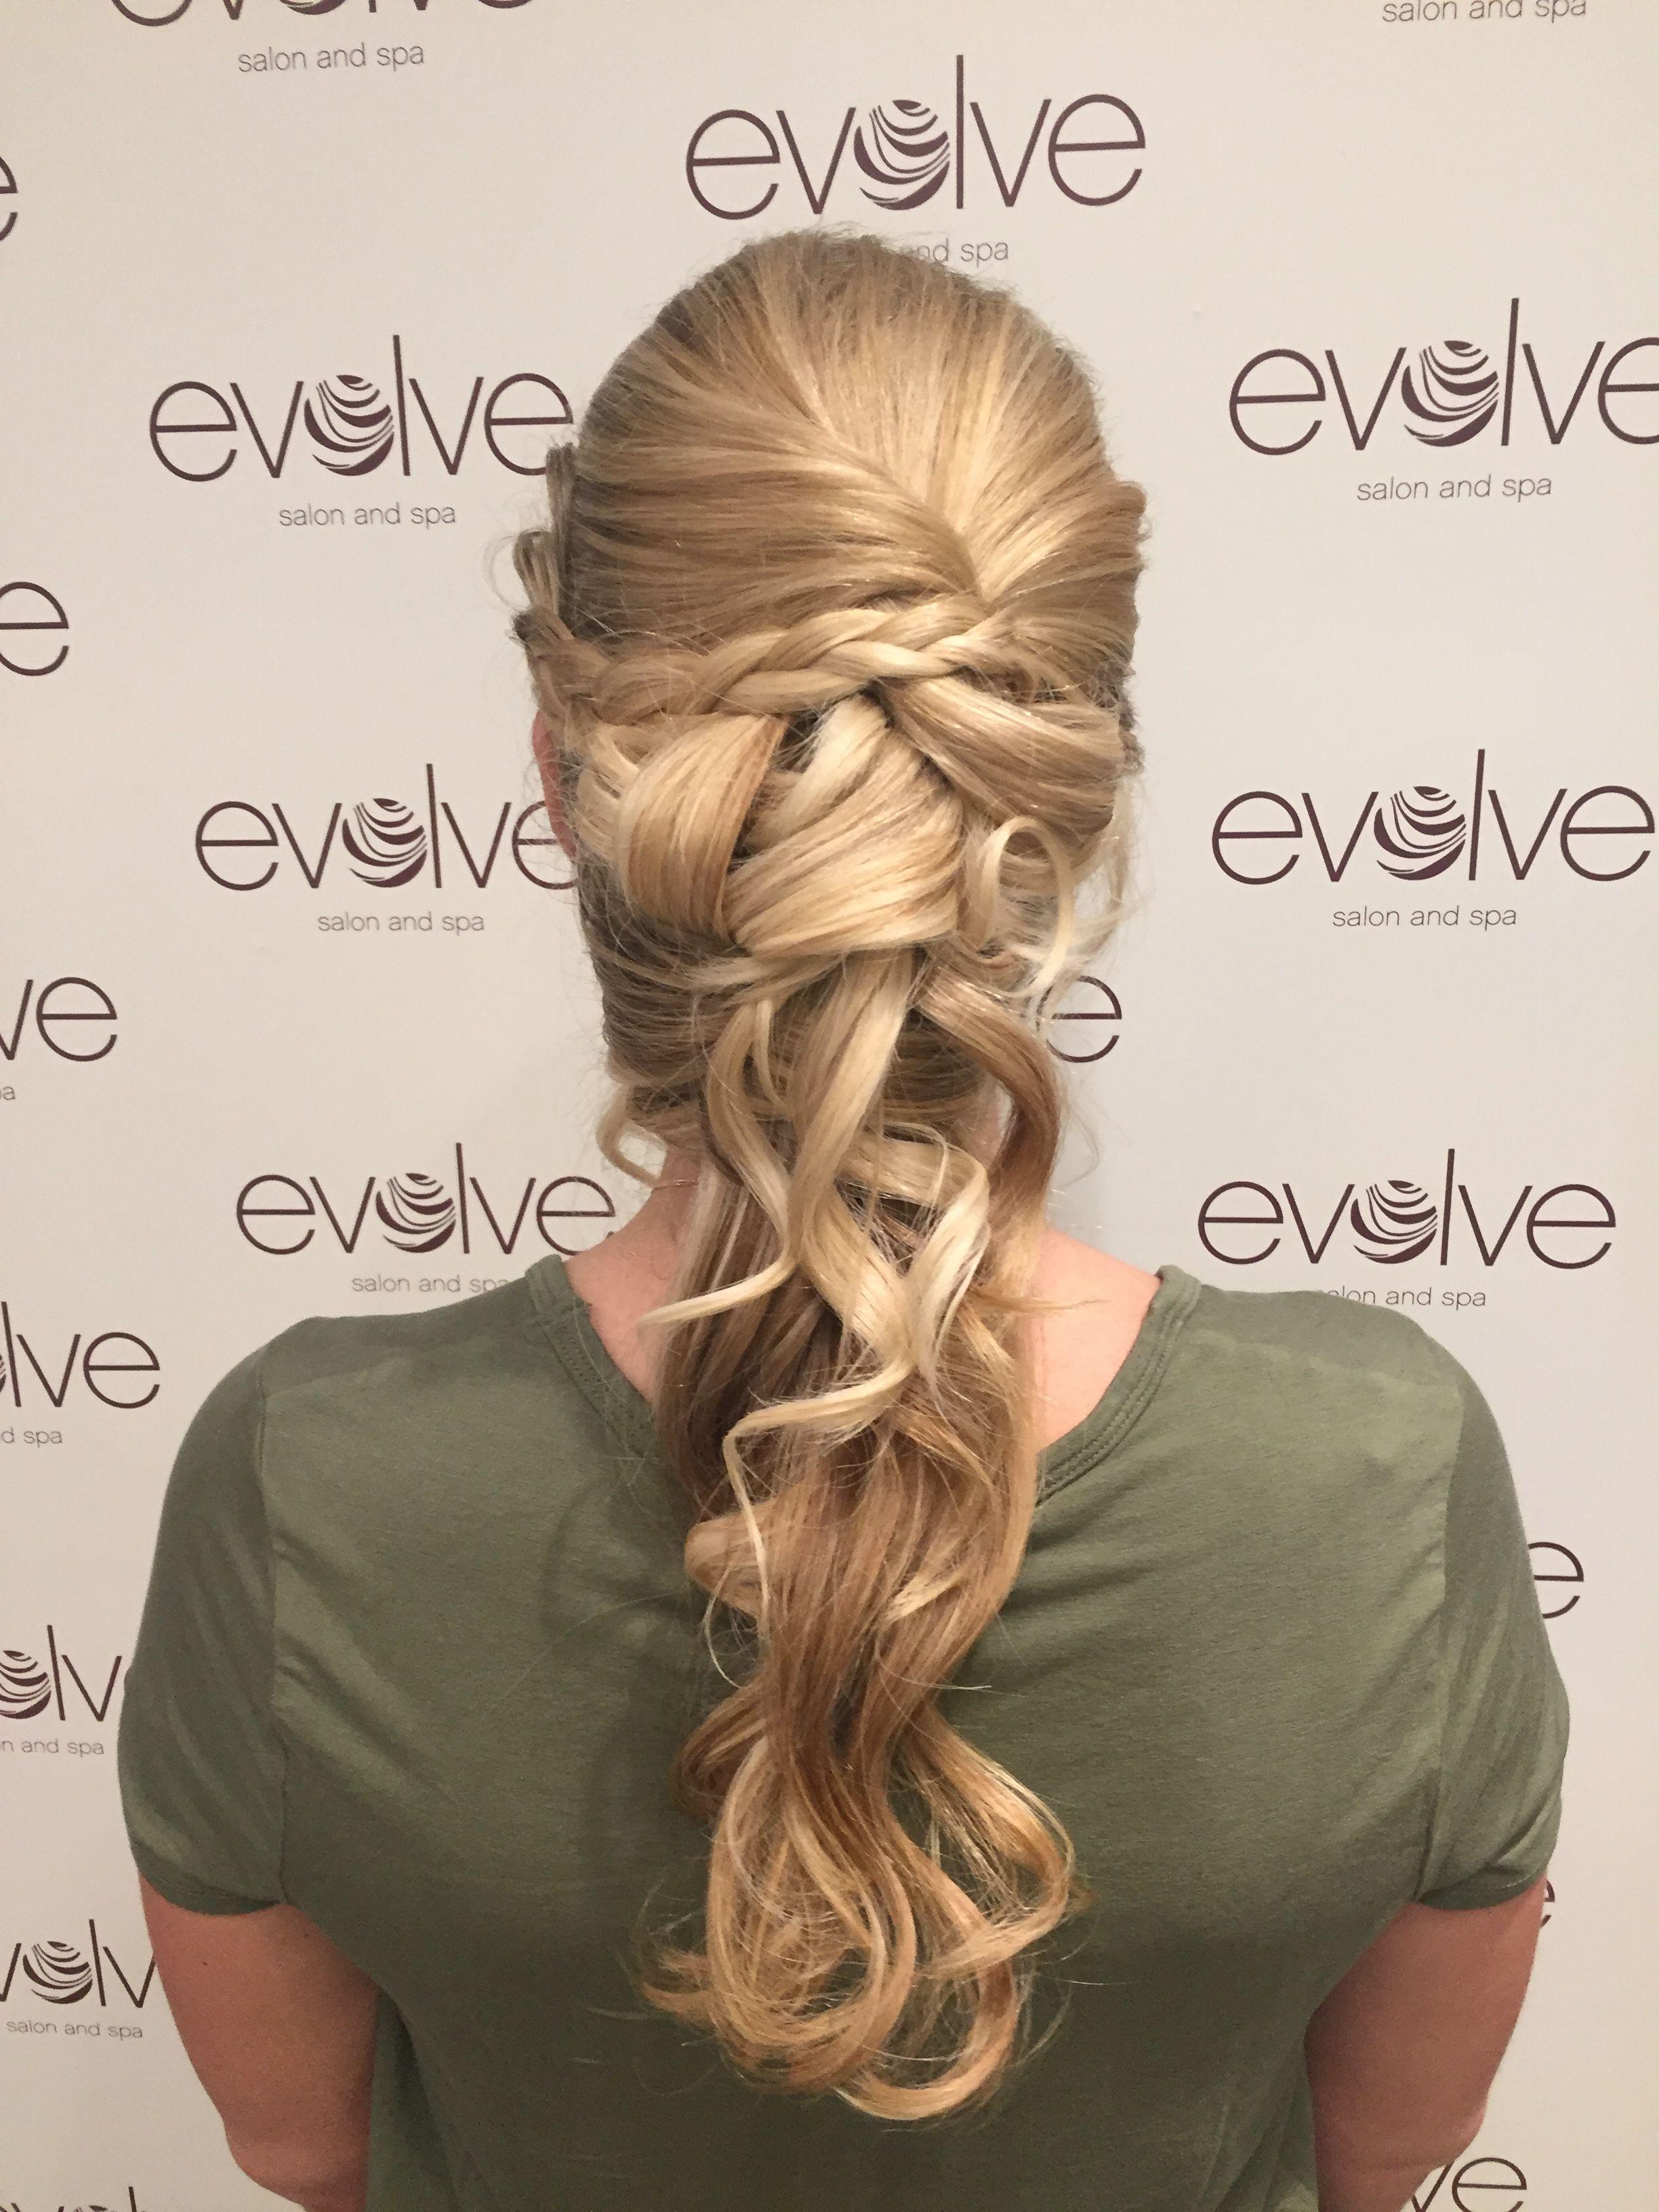 Sonia Hair Beauty Salon